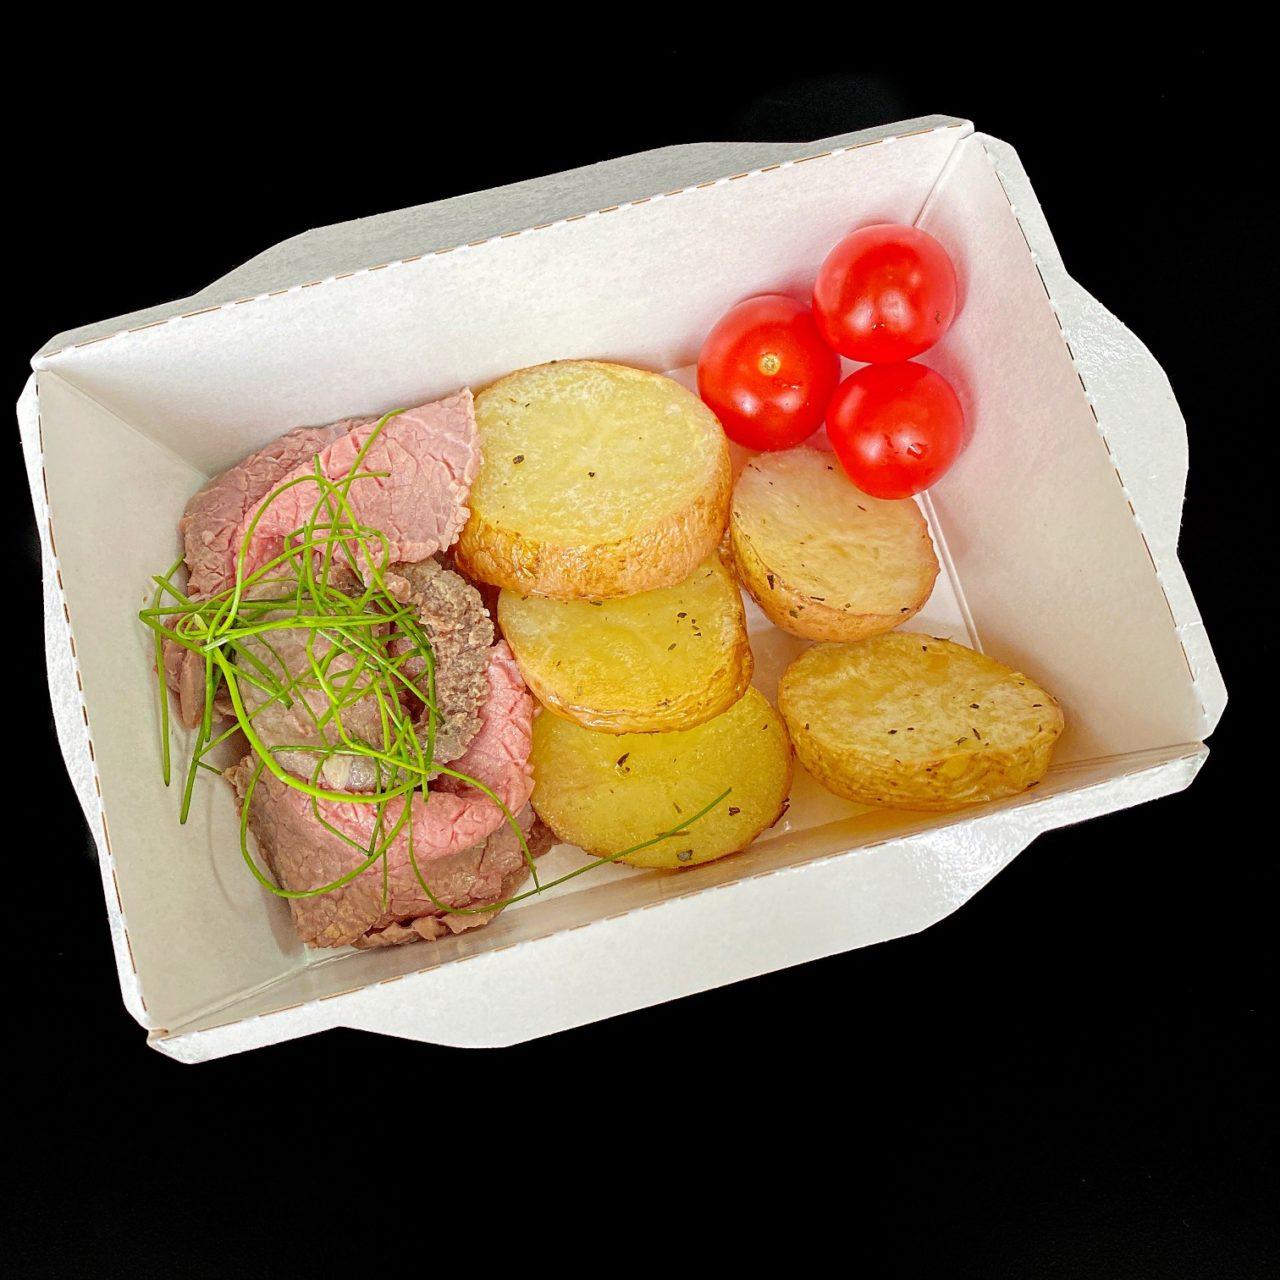 Ростбиф с мини картофелем и томатами